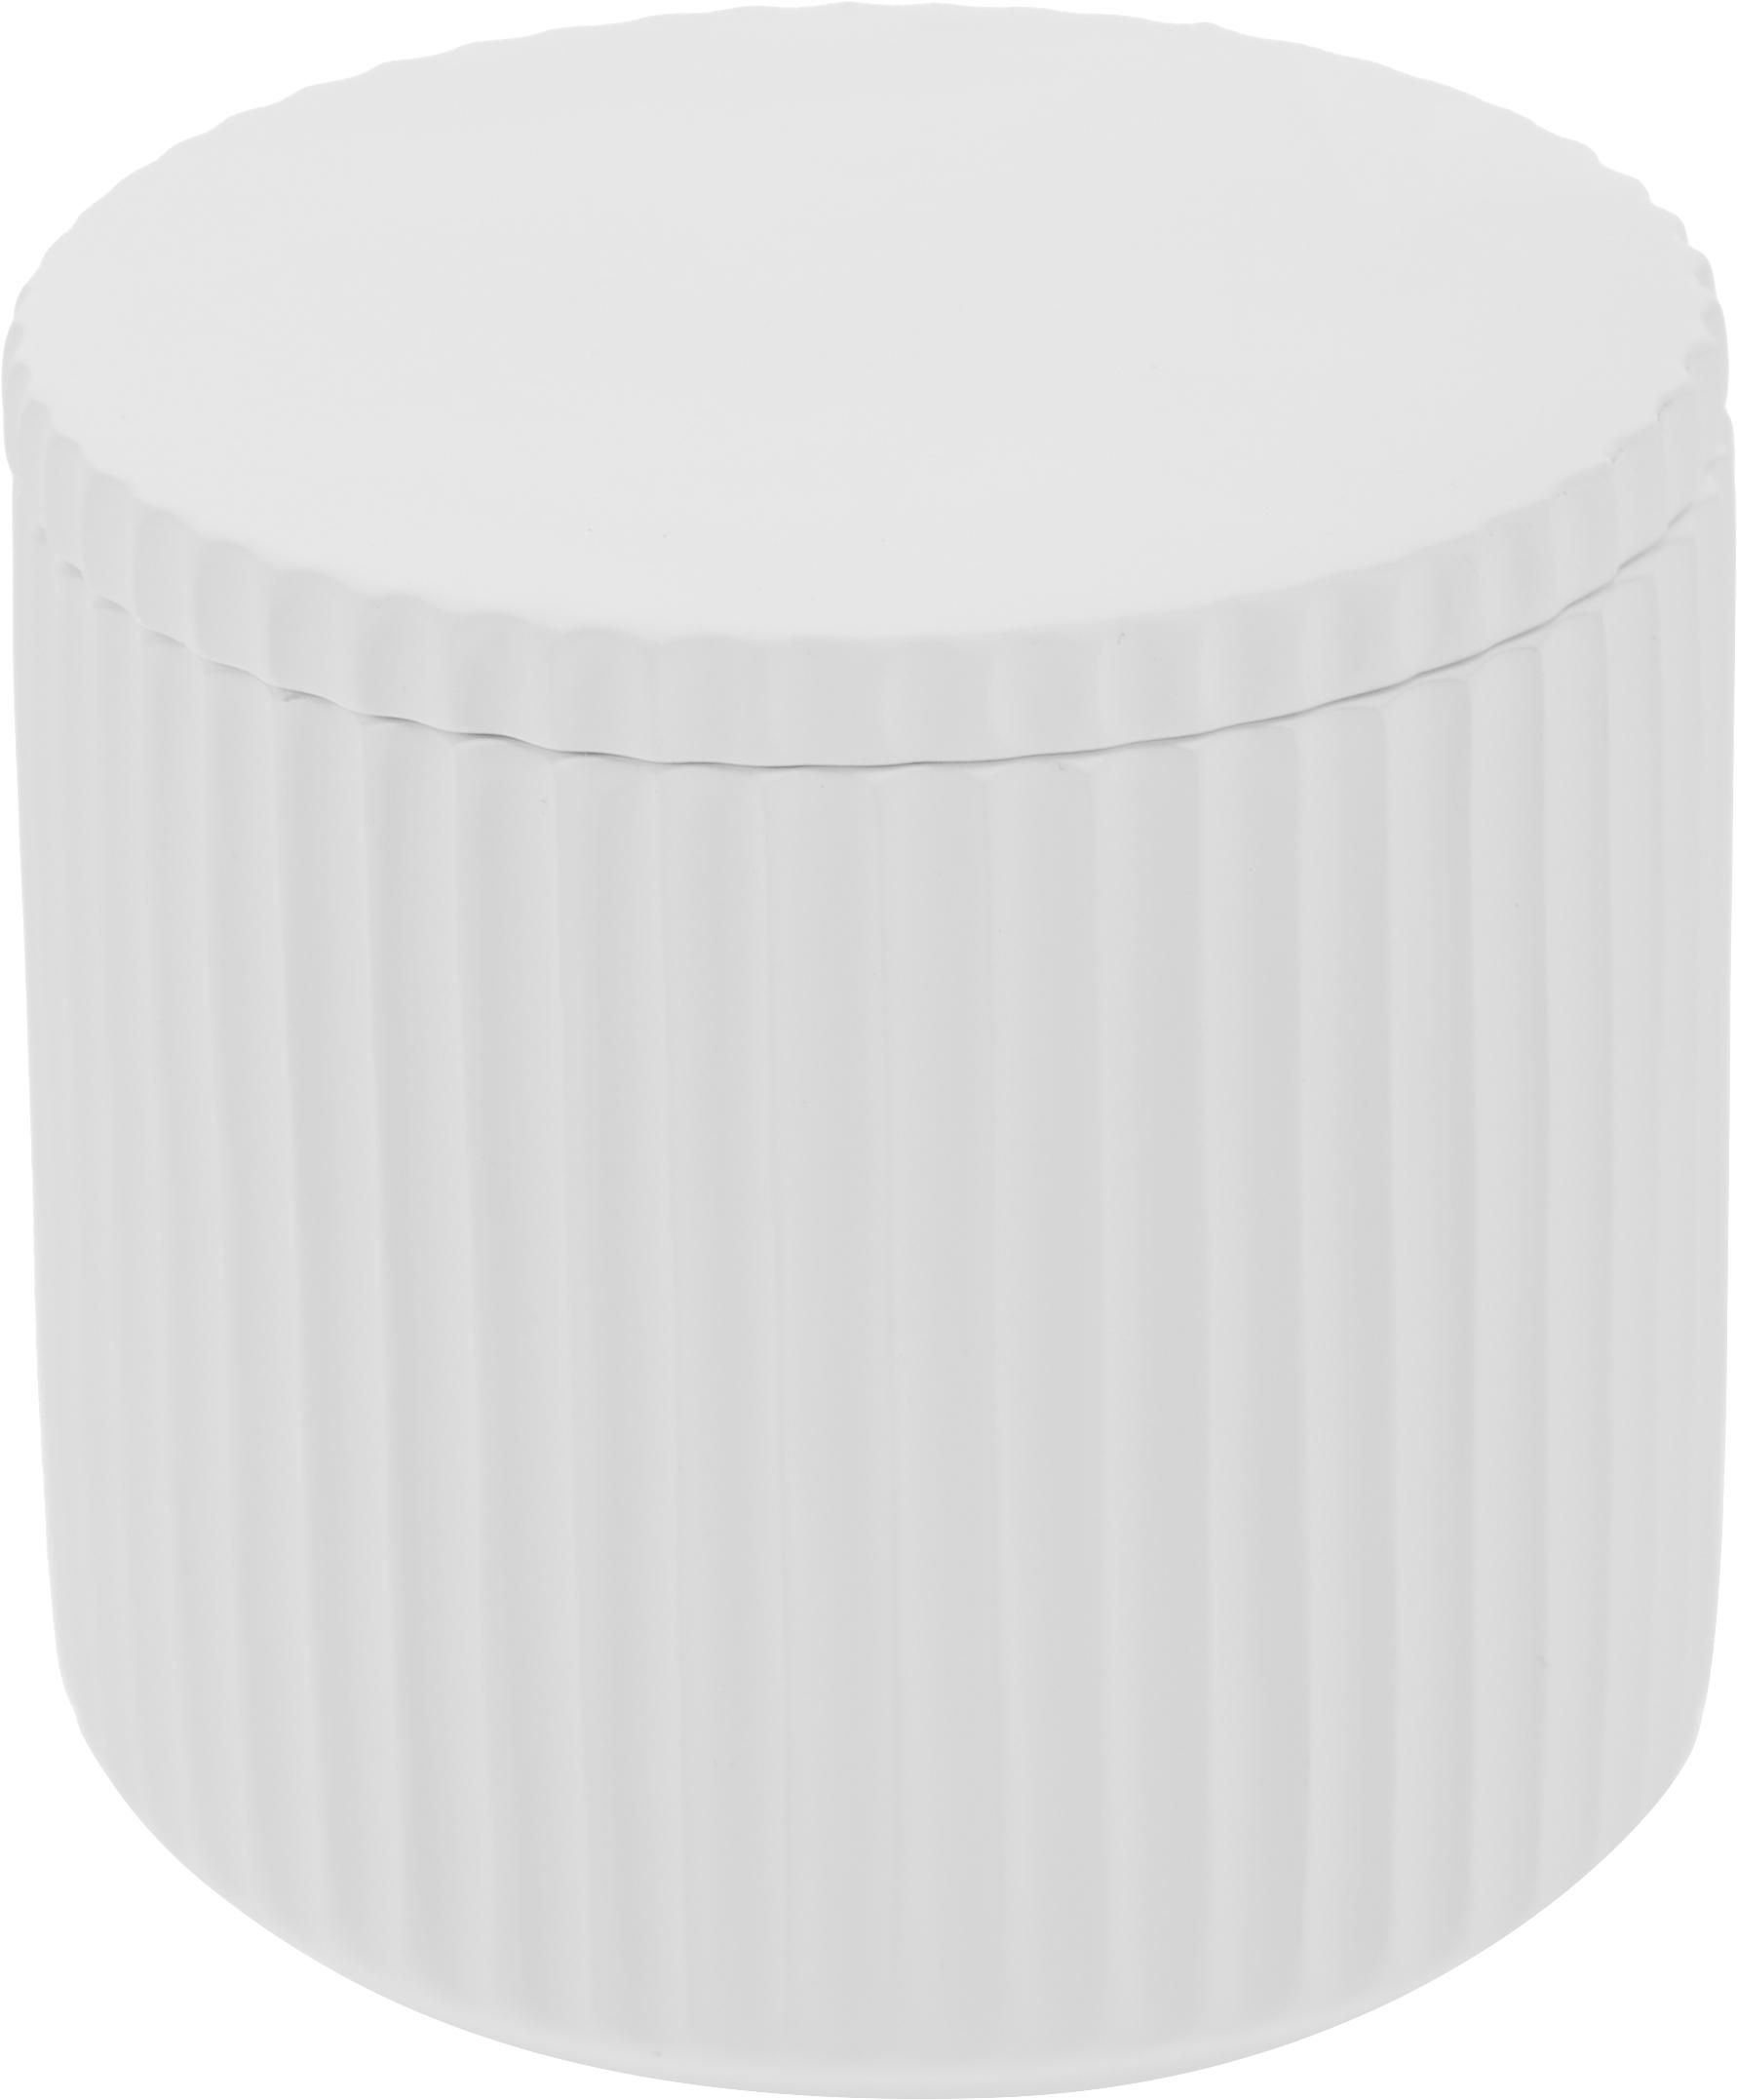 Caja decorativa Alessia, Porcelana, Blanco, Ø 9 x Al 9 cm